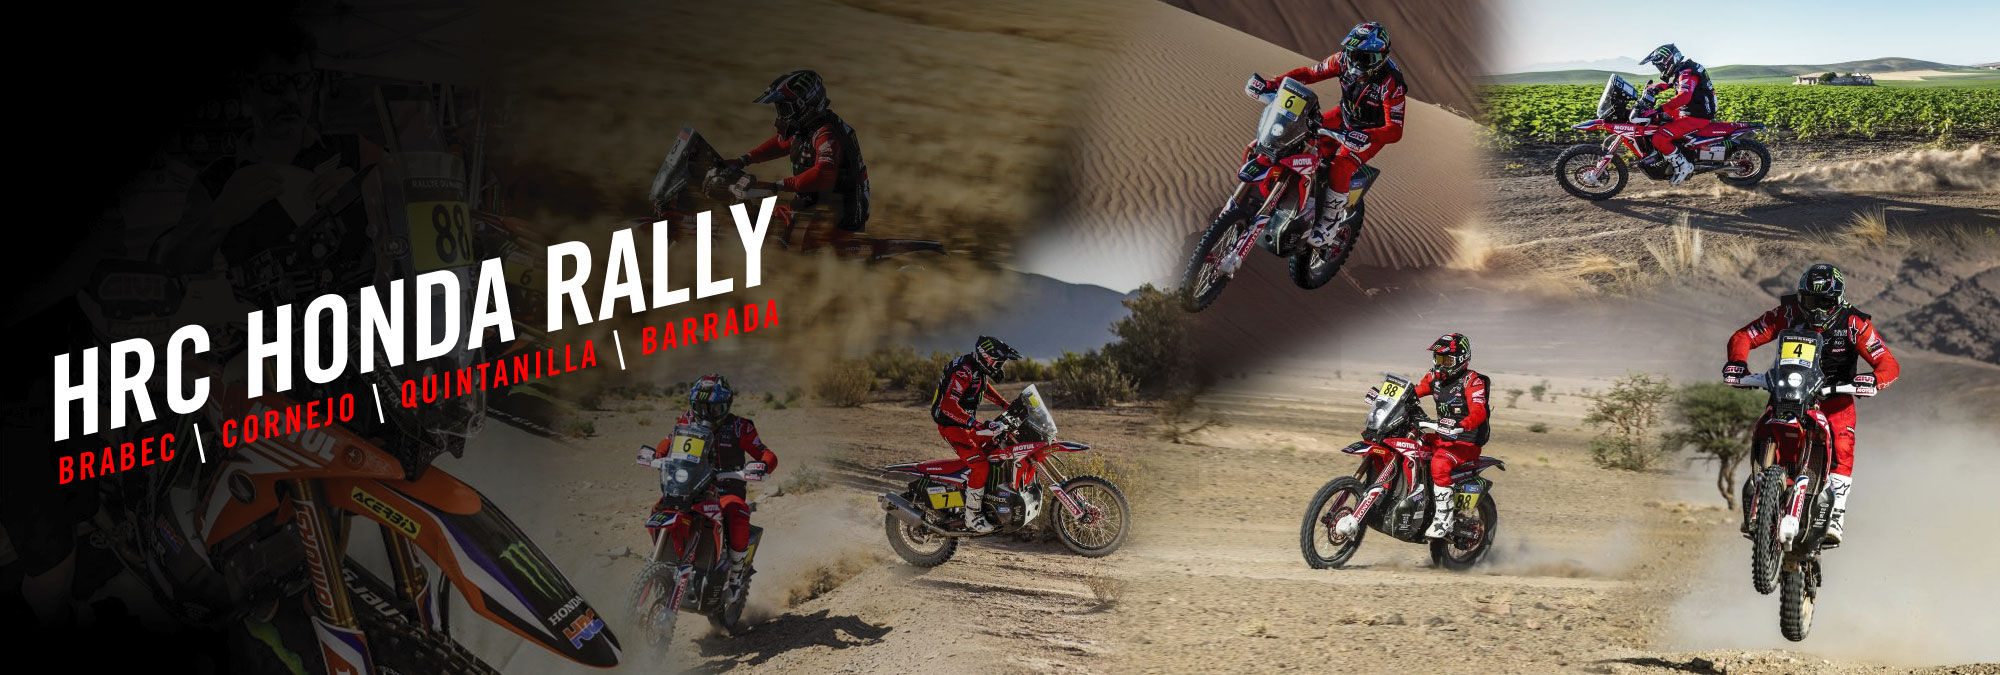 HRC Honda Rally